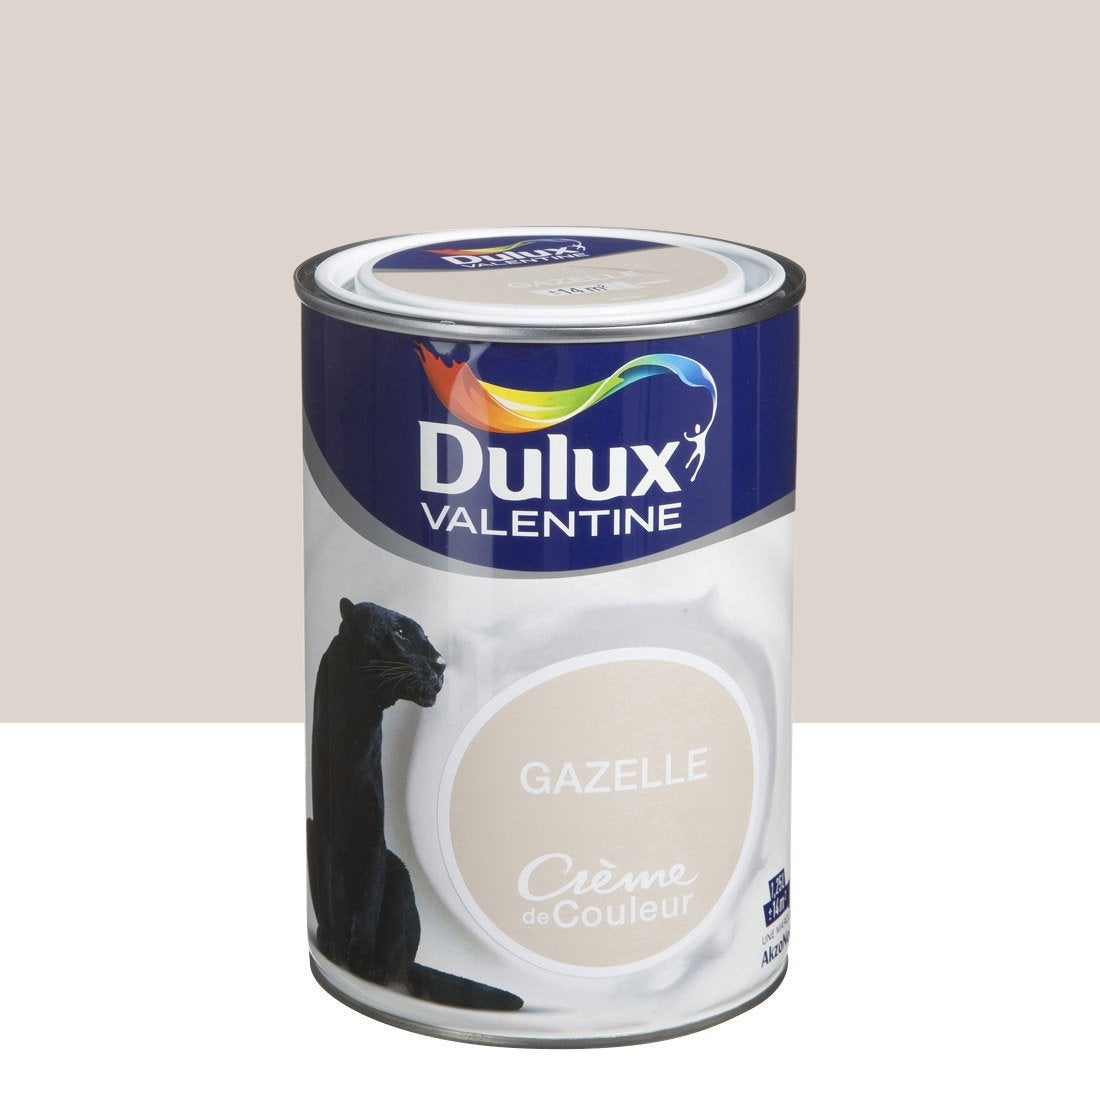 peinture brun gazelle satin dulux valentine cr me de. Black Bedroom Furniture Sets. Home Design Ideas